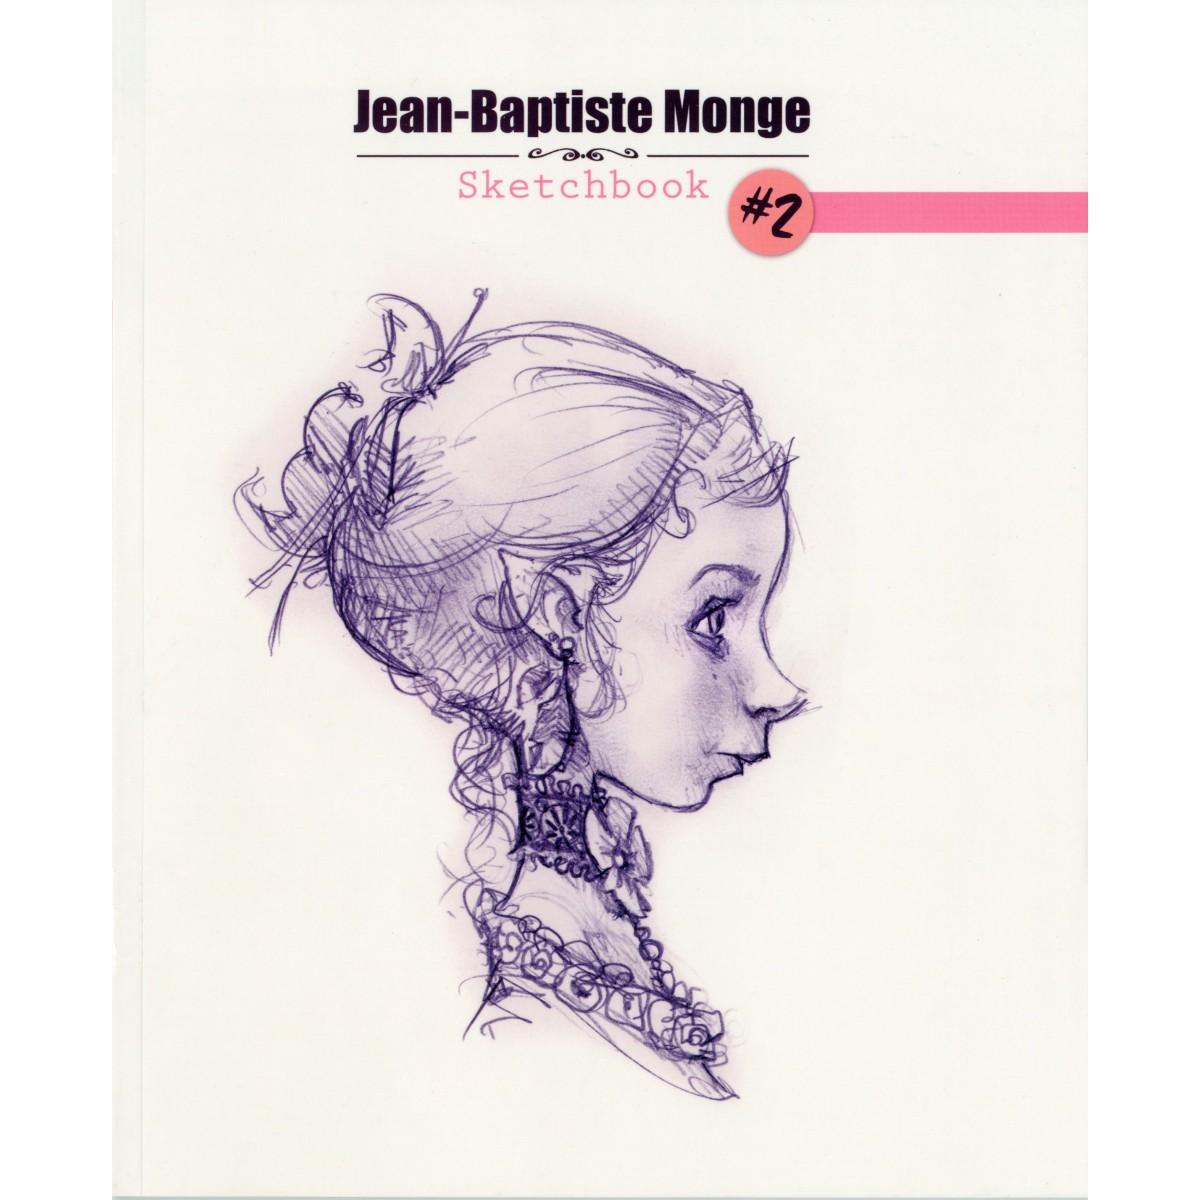 Jean-Baptiste Monge - A World of Imagination